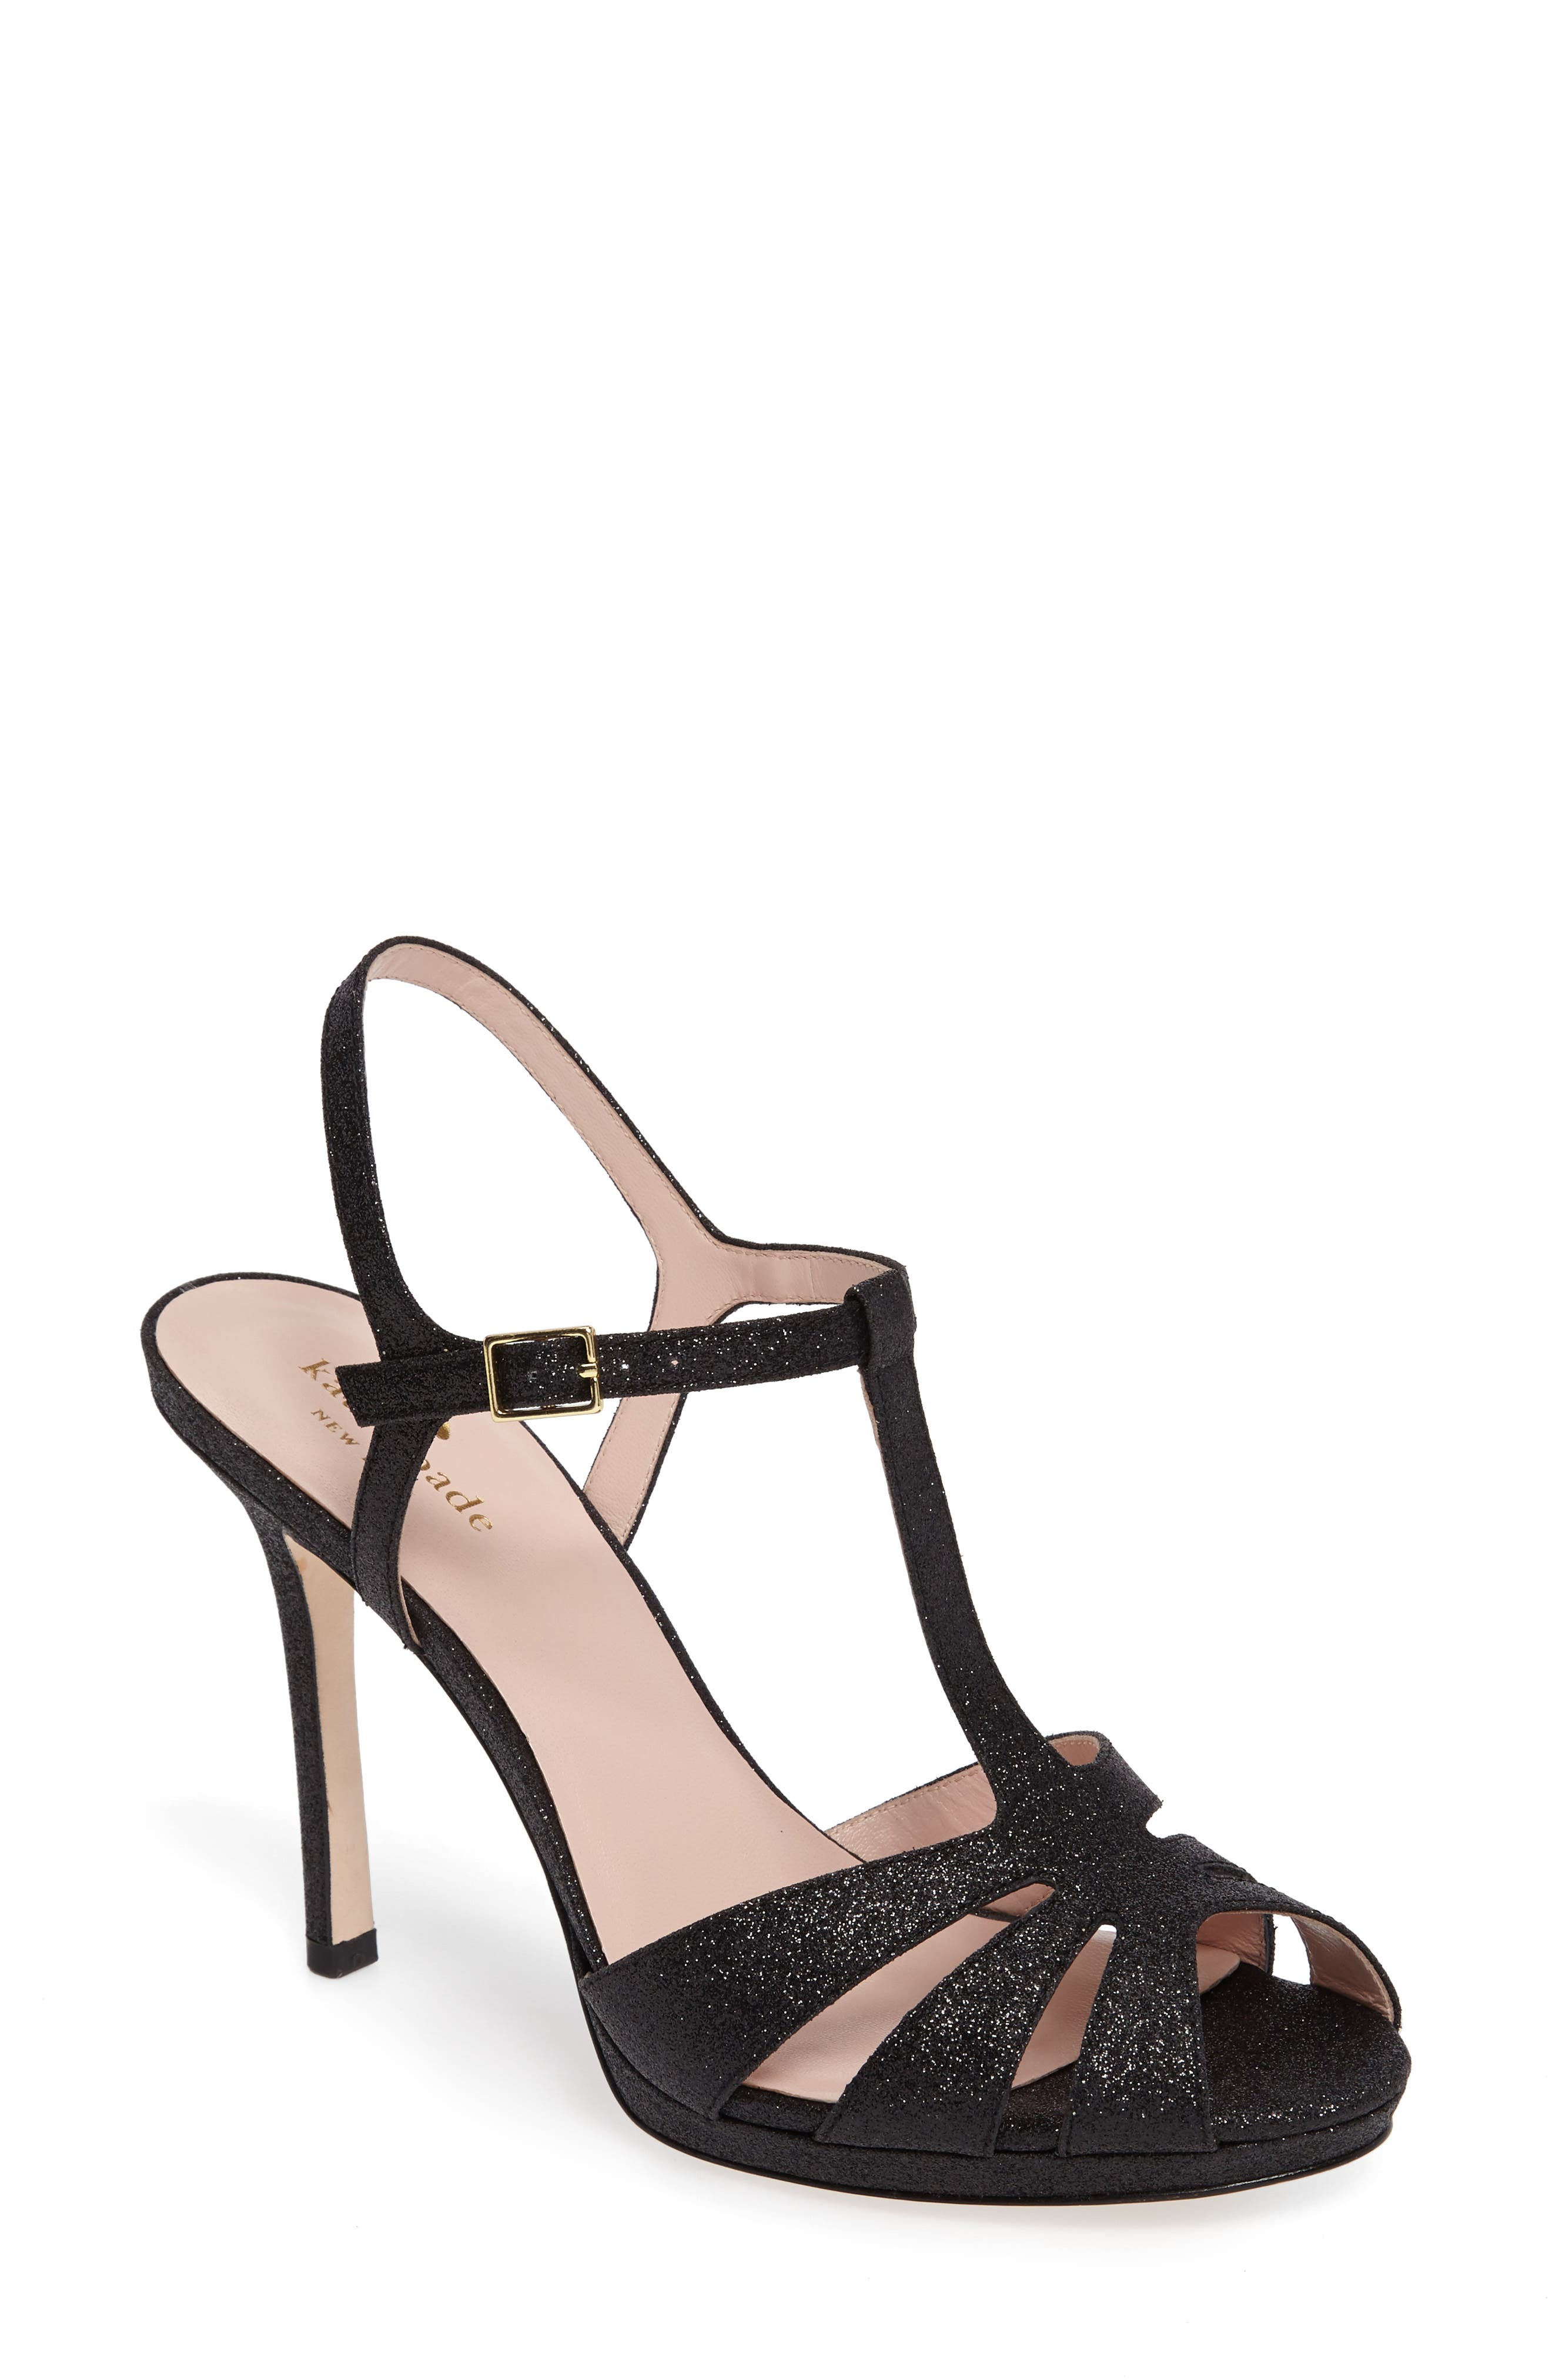 kate spade new york feodora sandal (Women)